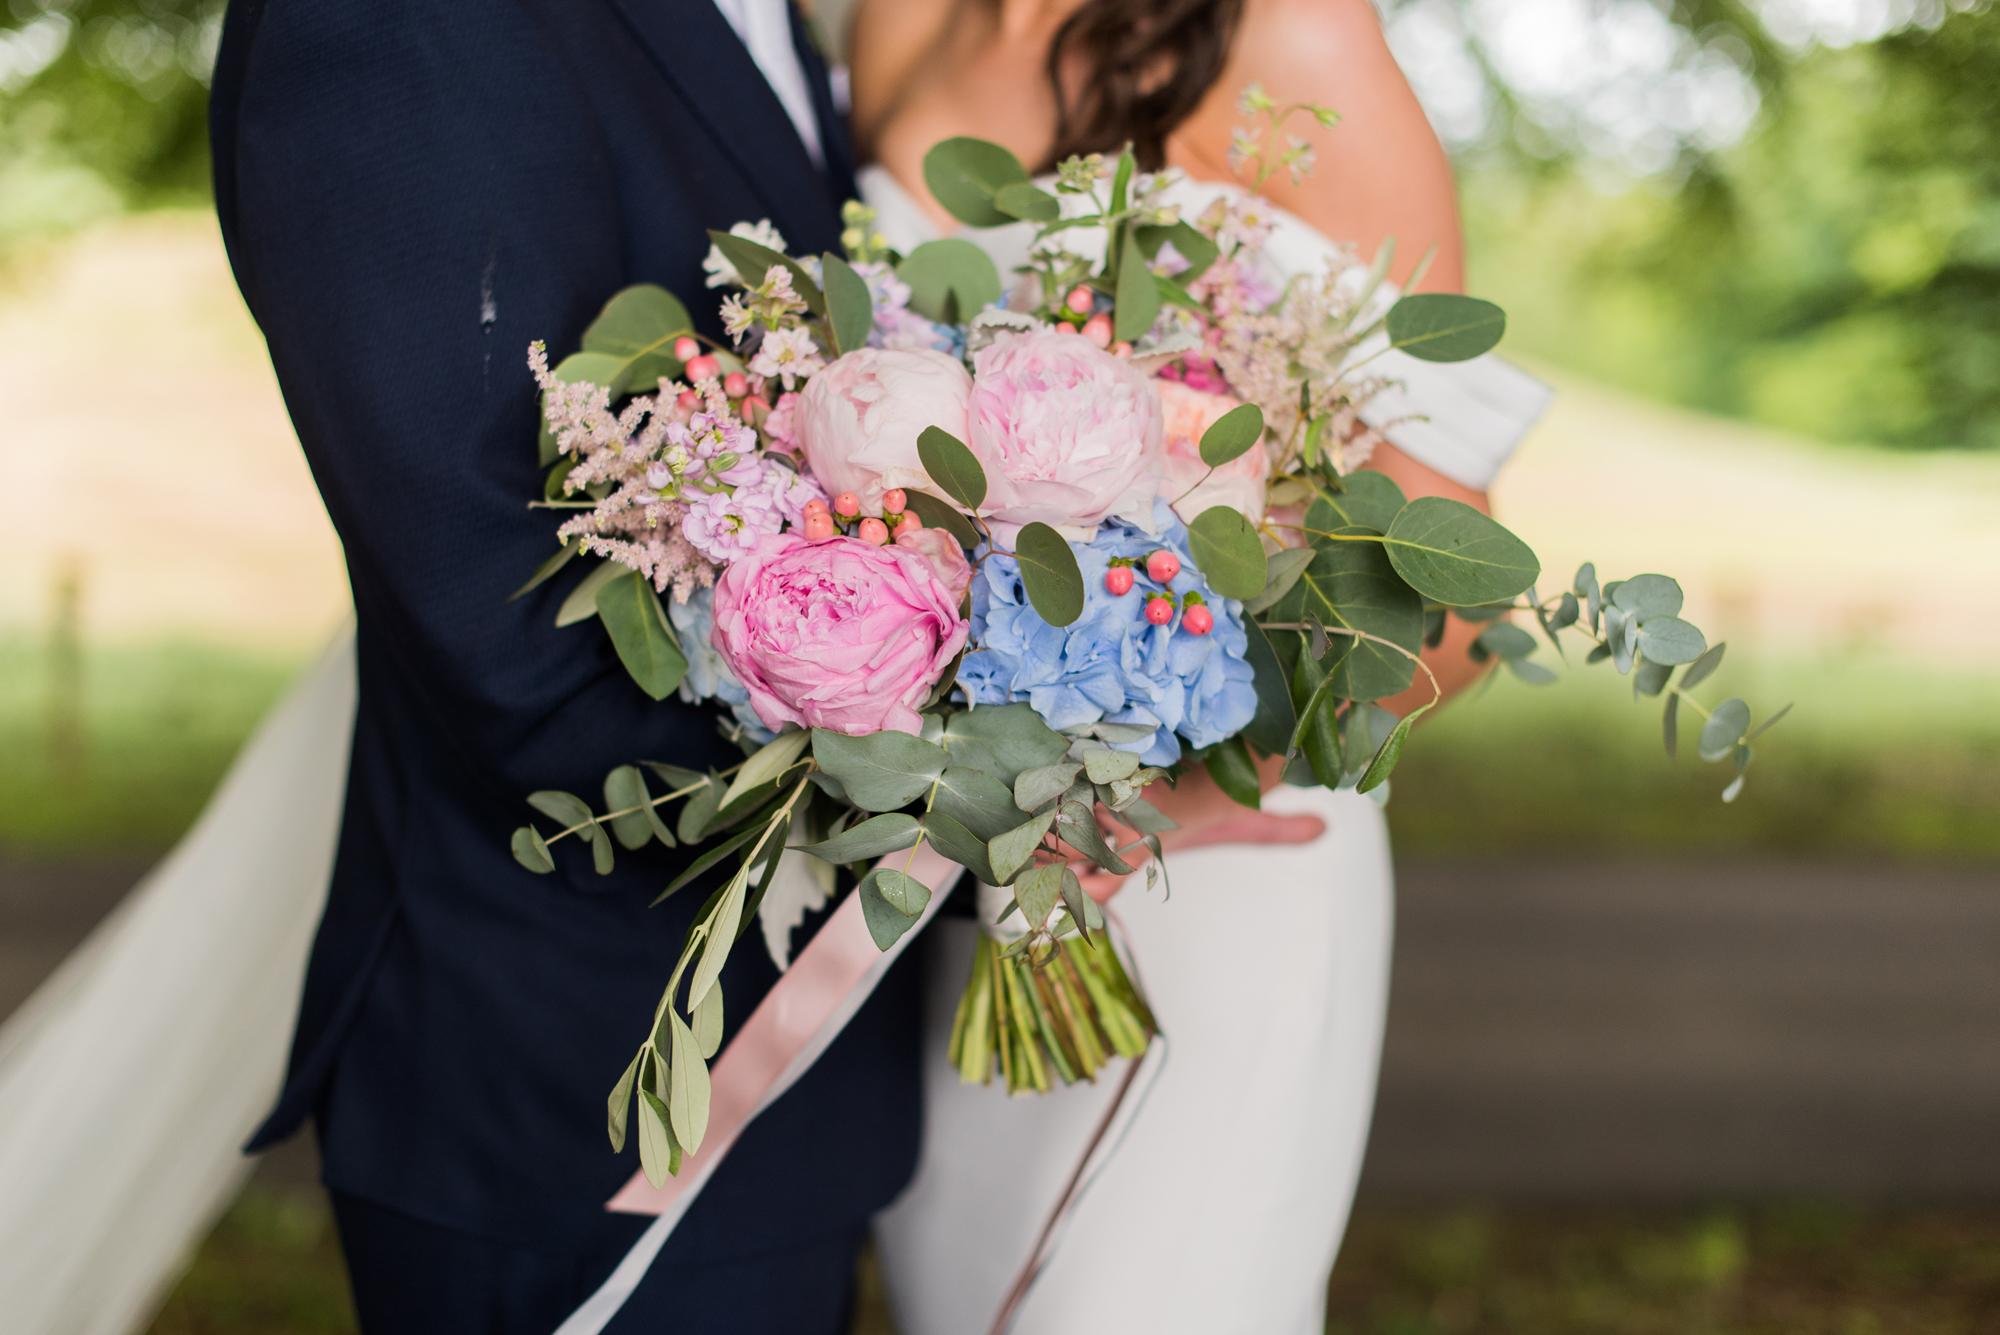 mark_barton_Wedding_photographer_northern_ireland_12.jpg